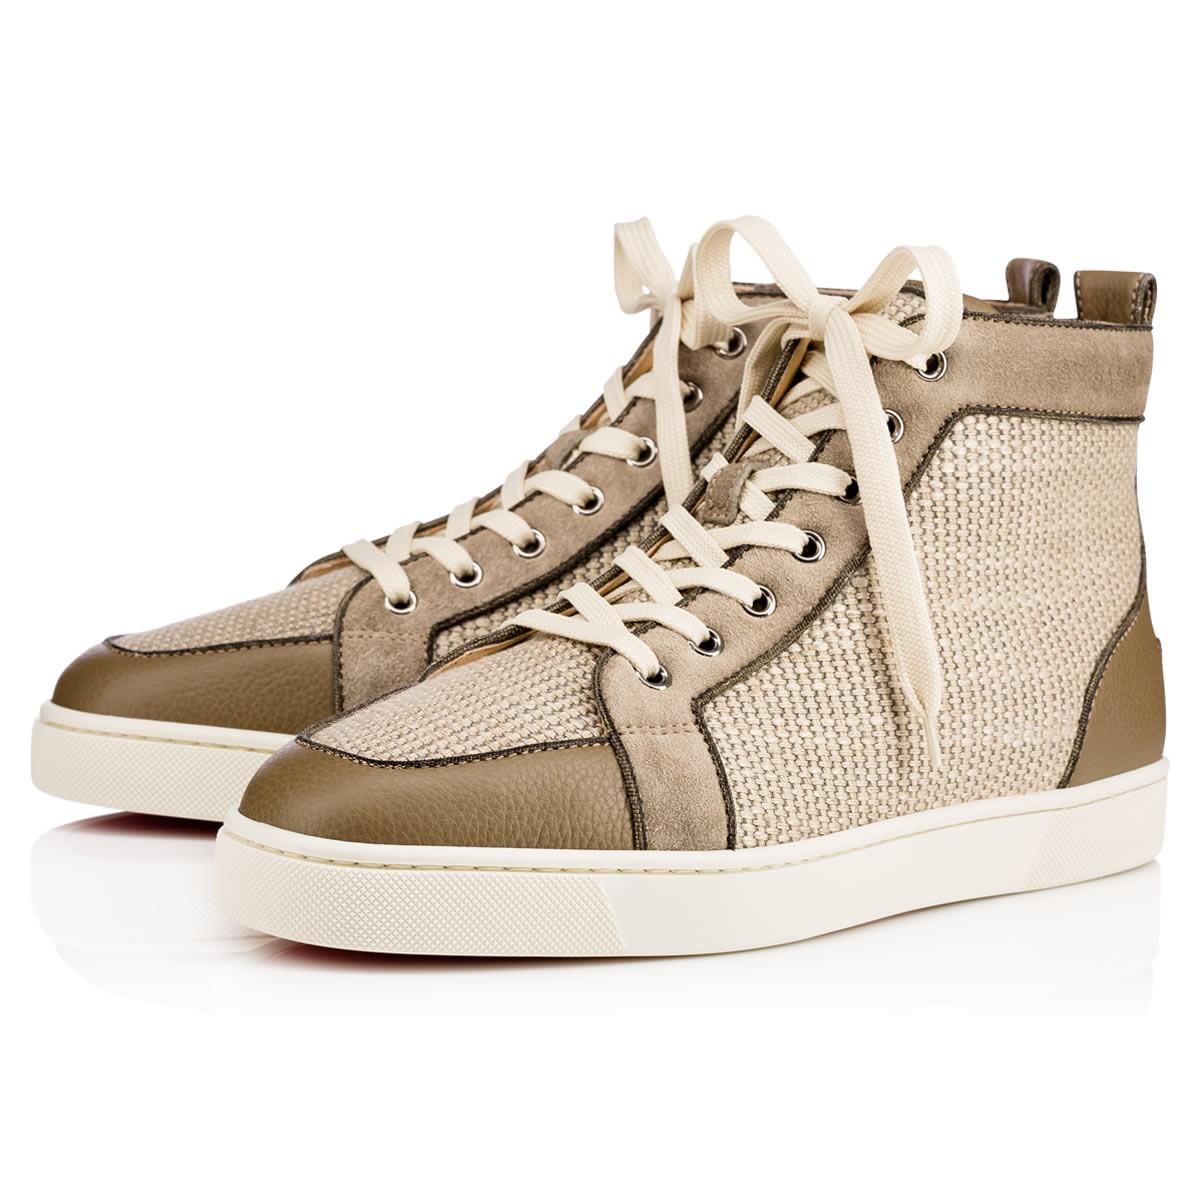 77ef5ba3ab87 Christian Louboutin Rantus Orlato Flat Sneakers In Poivre Vert ...